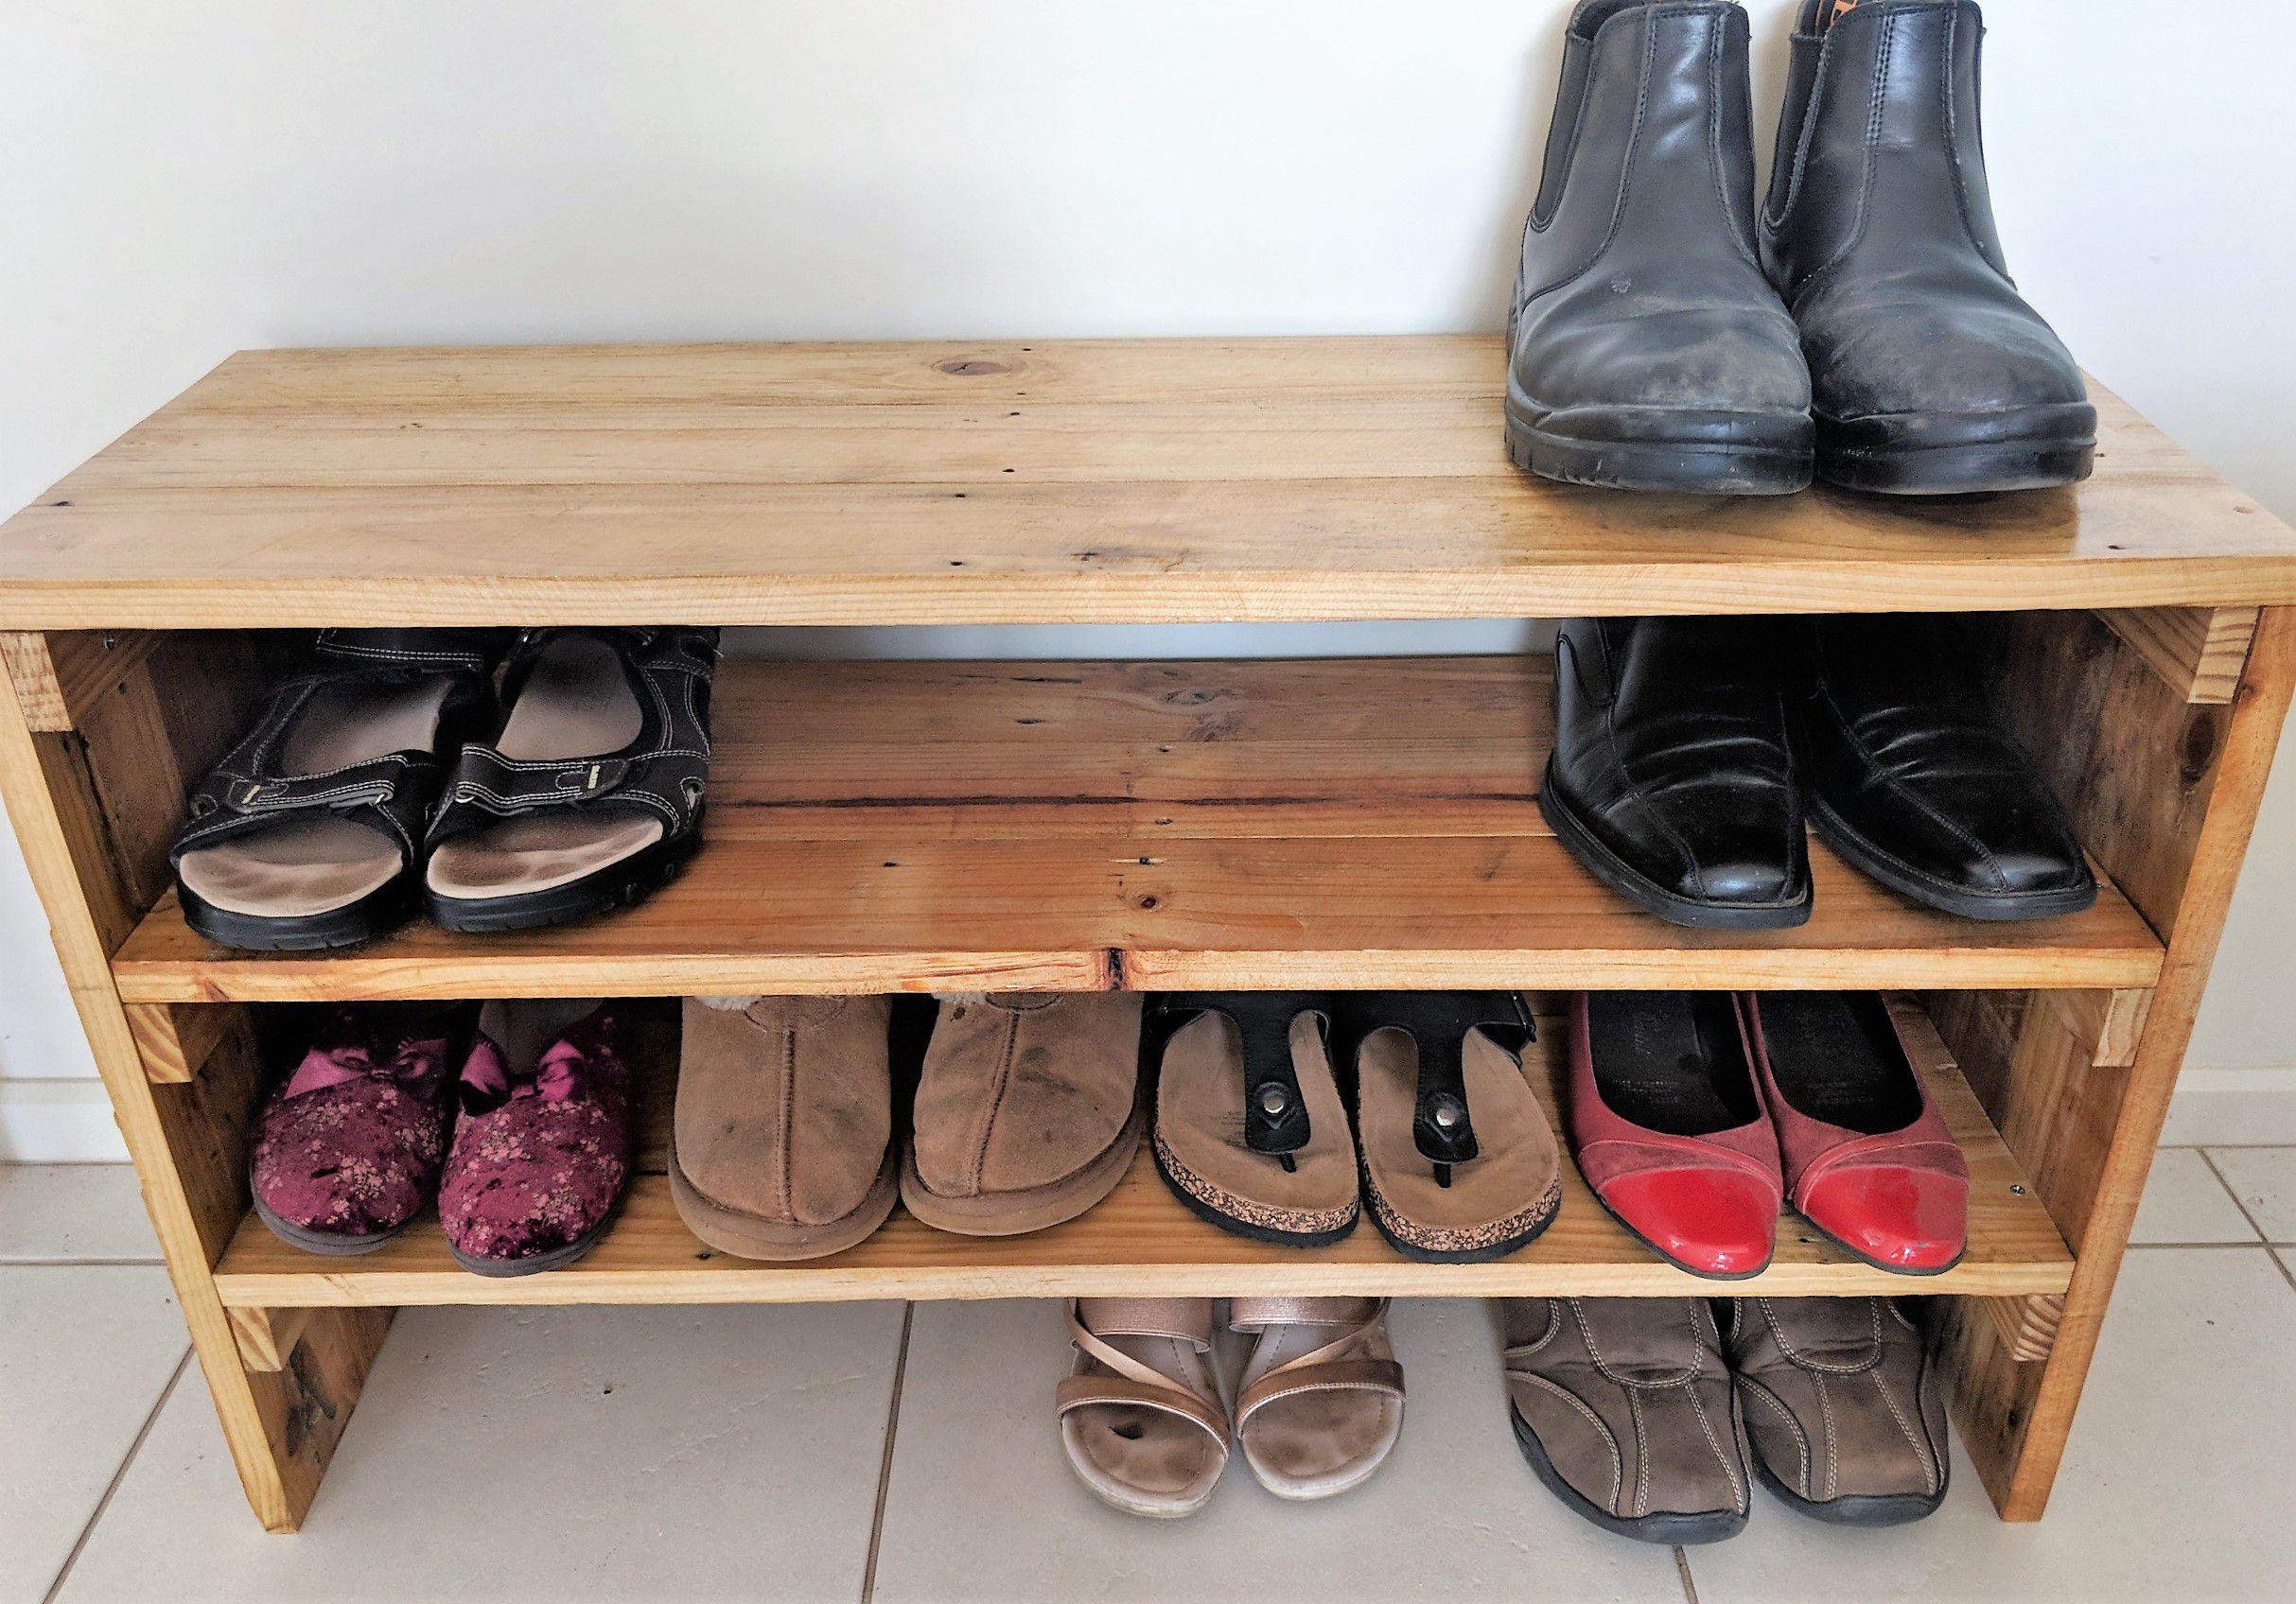 shelforganiser storagerack woodrack customwoodrack shoeshelftiers shoewoodbench woodfurniture shoestorage shoerack